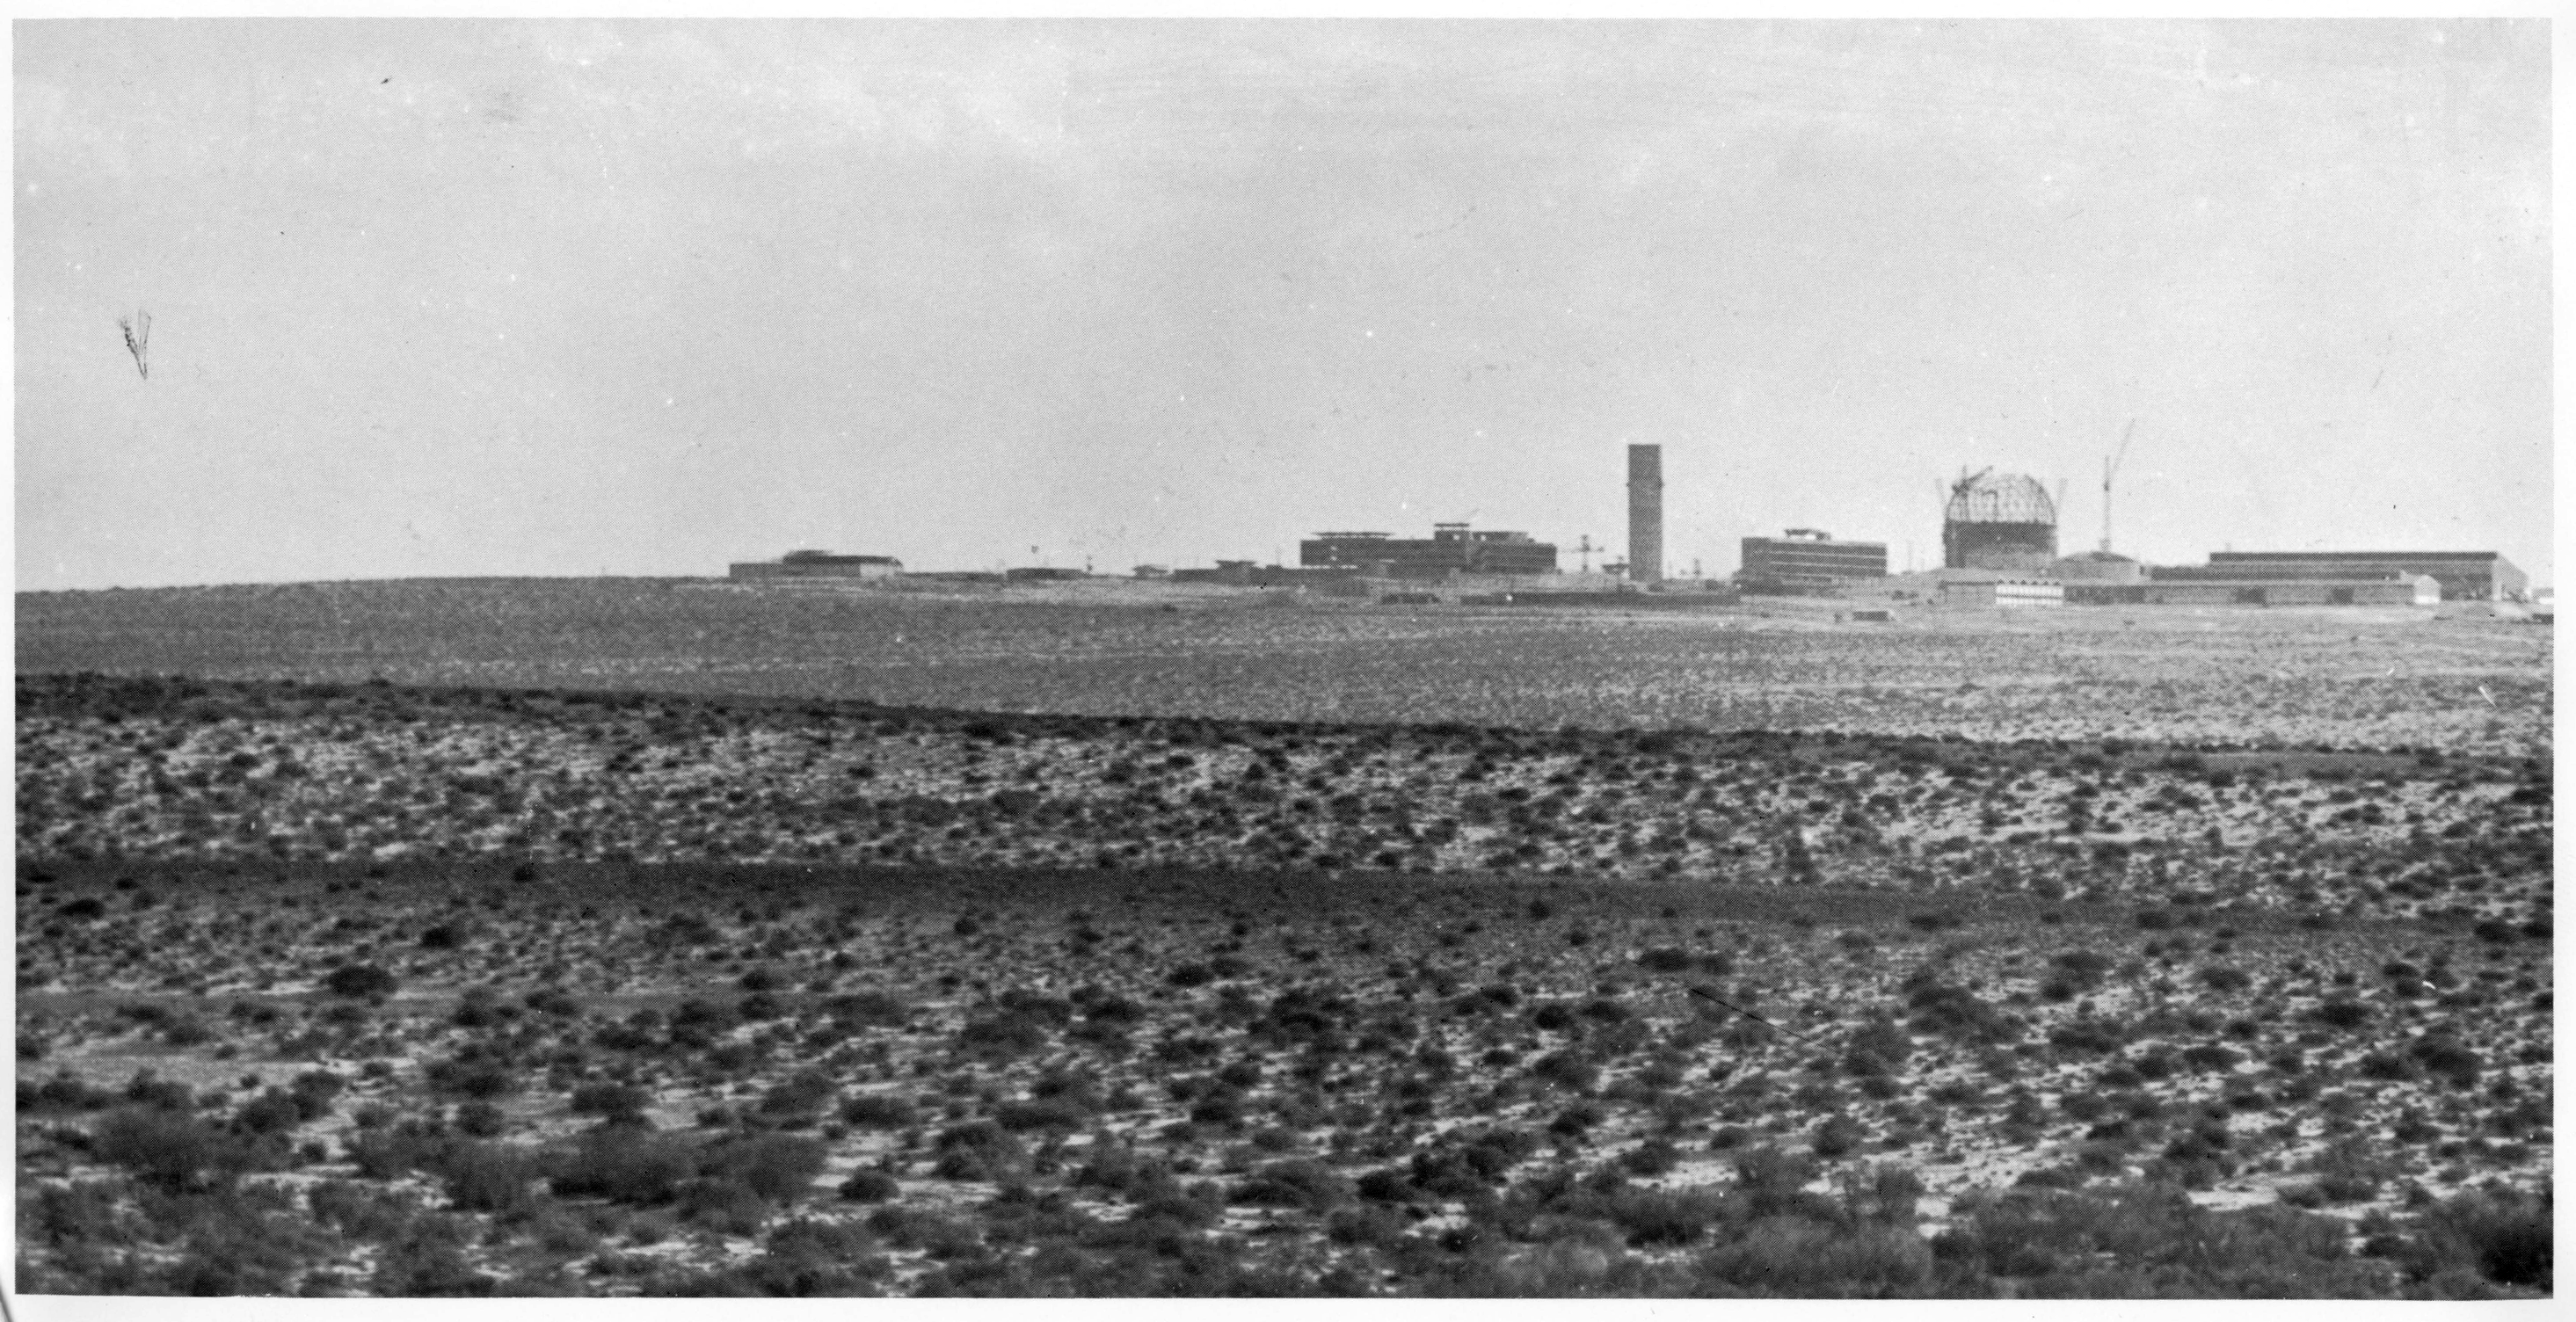 construction site near Dinoma in the Negev desert